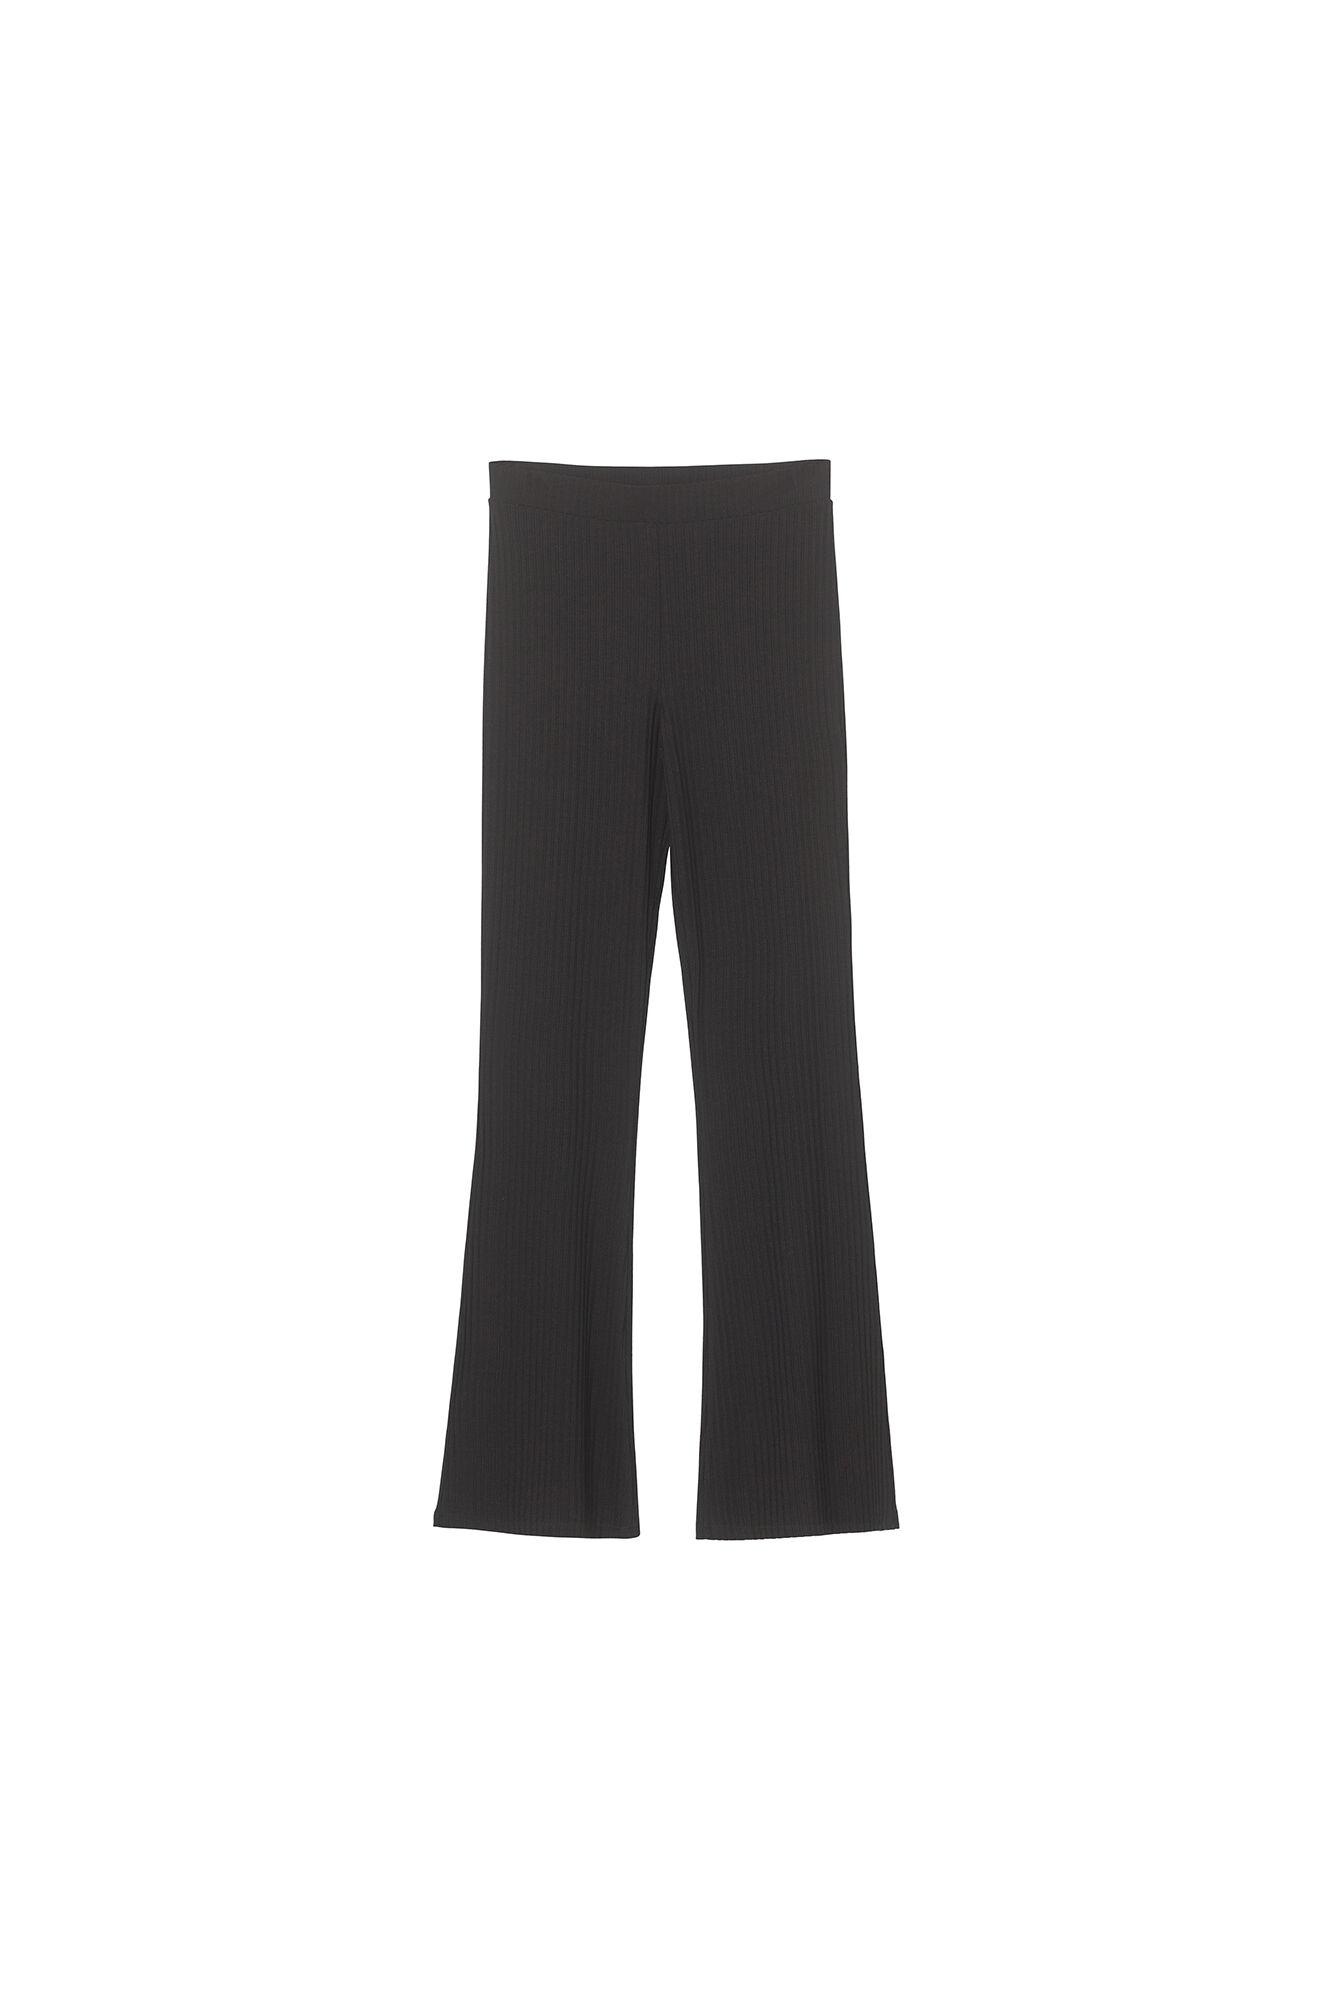 ENFAIREY PANTS 5323, BLACK